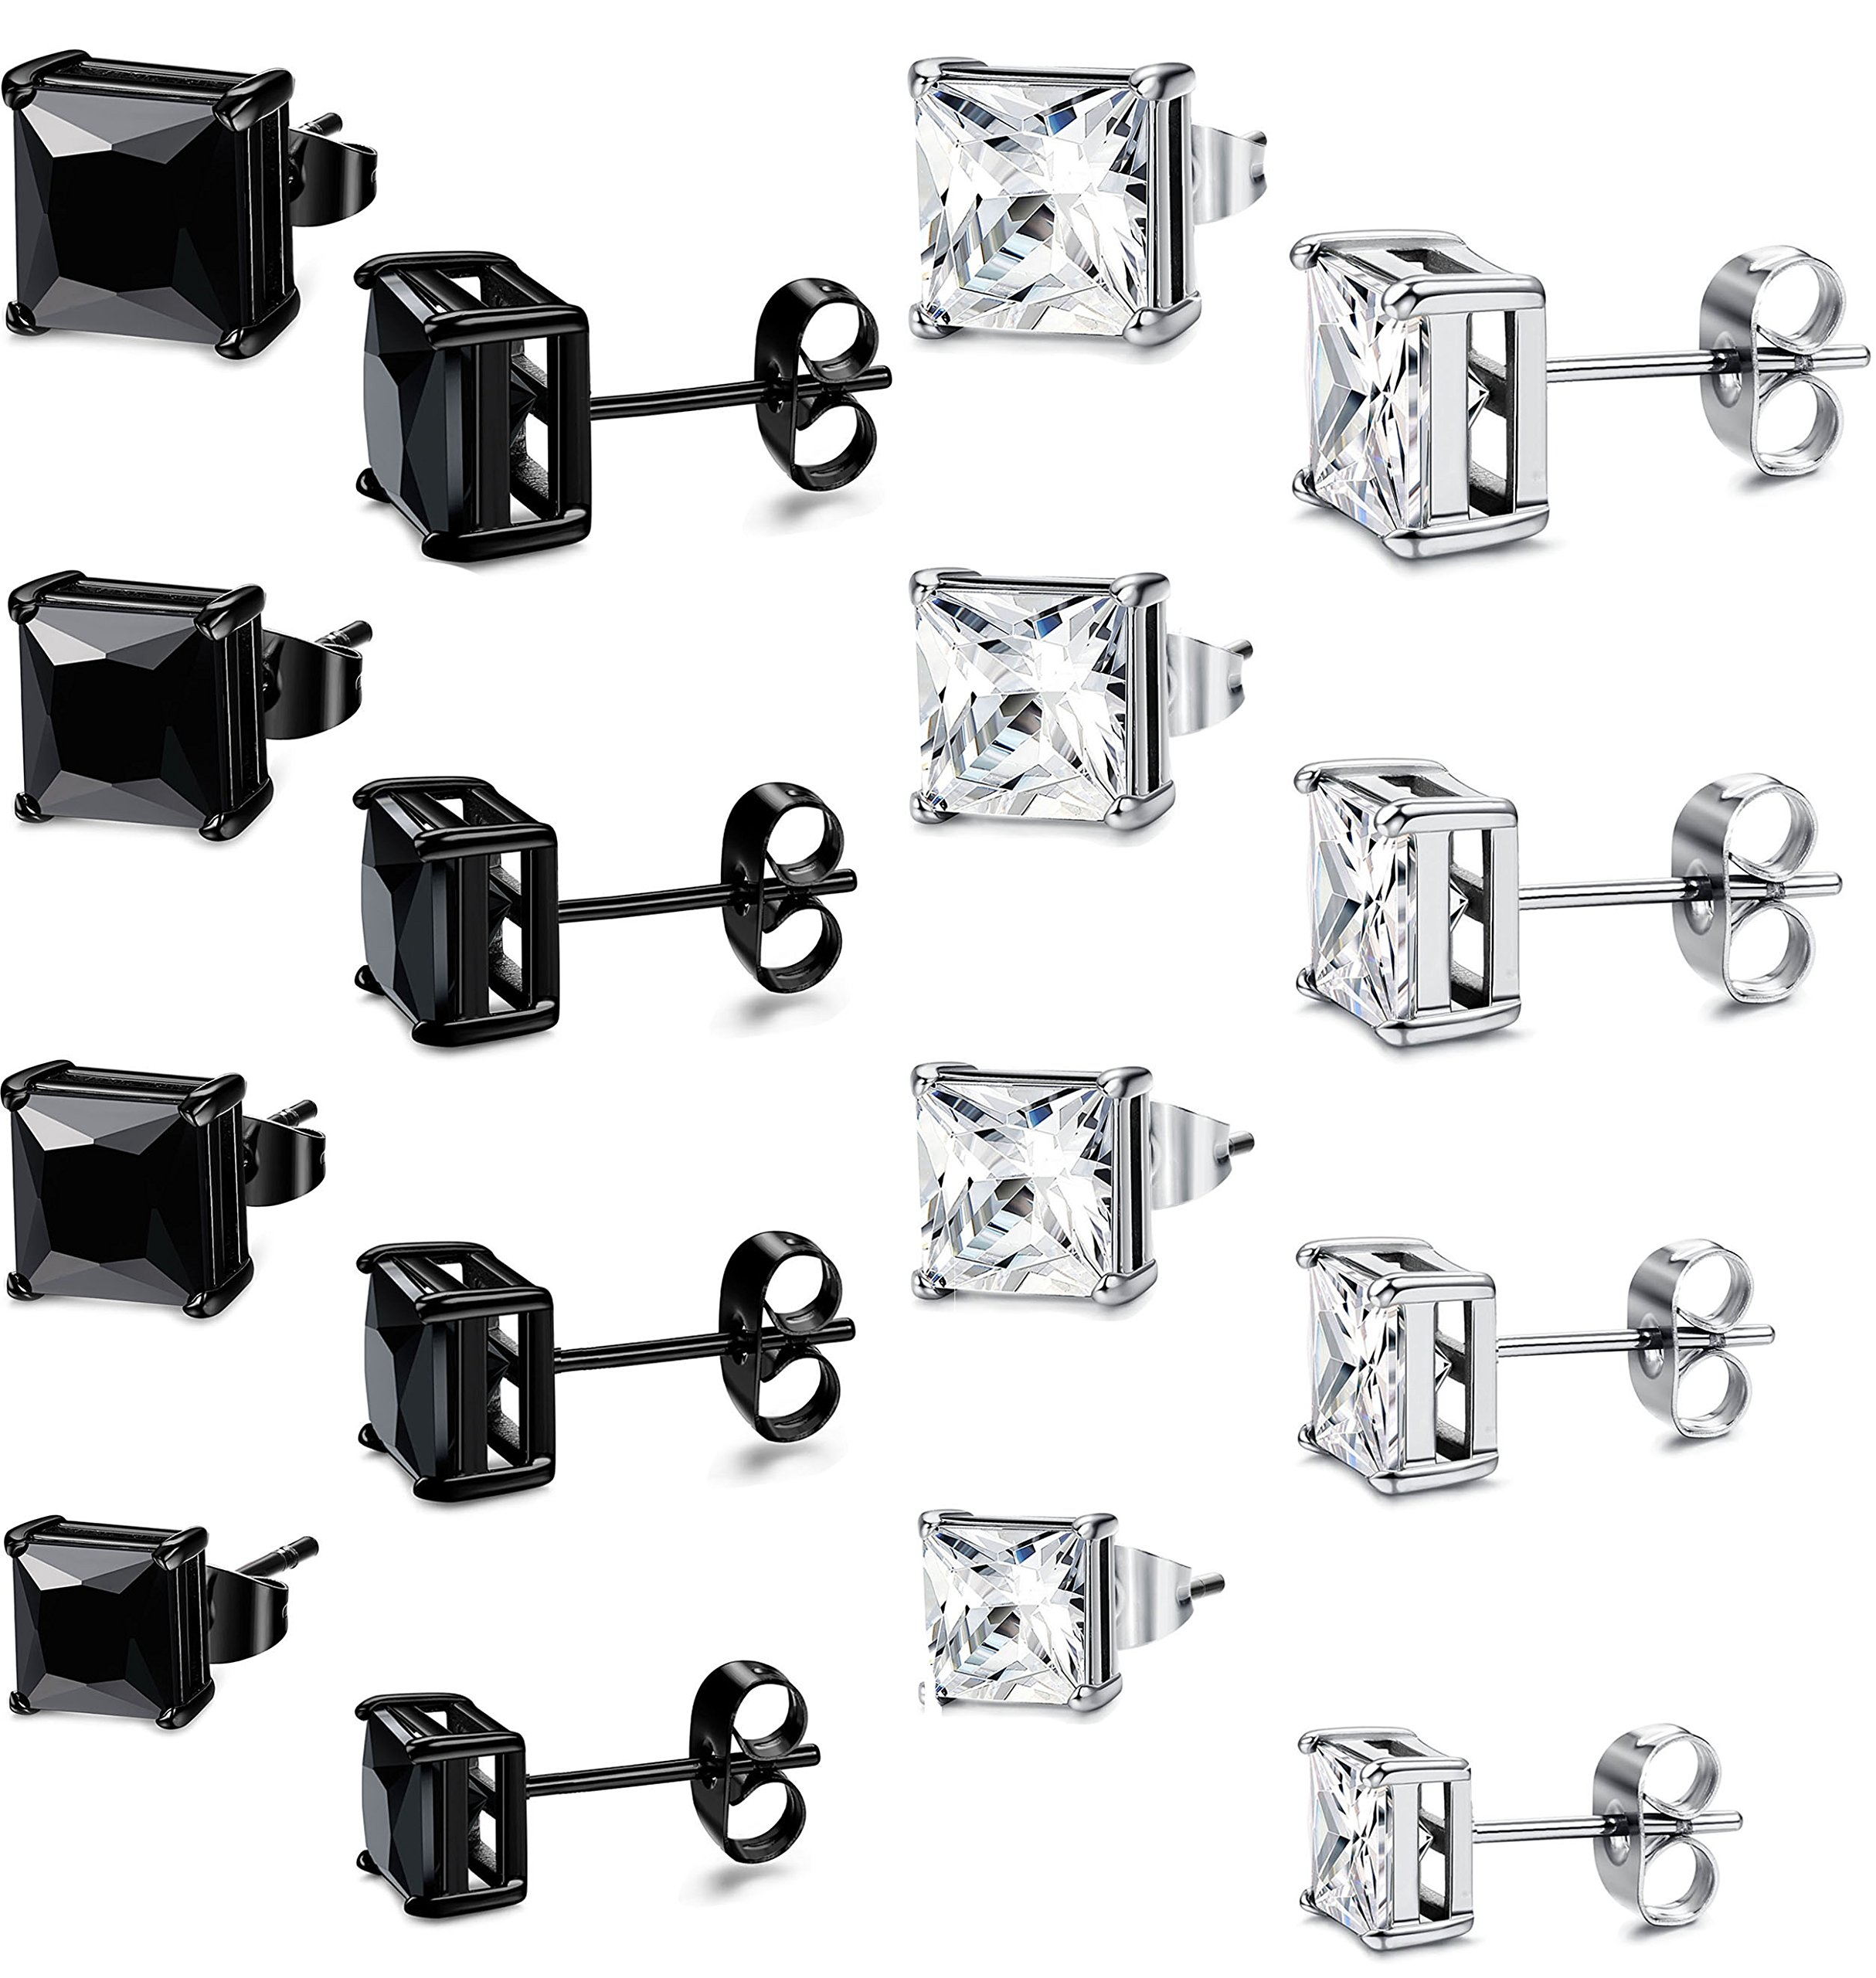 FIBO STEEL 8 Pairs CZ Stud Earrings for Women Men Stainless Steel Earrings Set,3-6MM